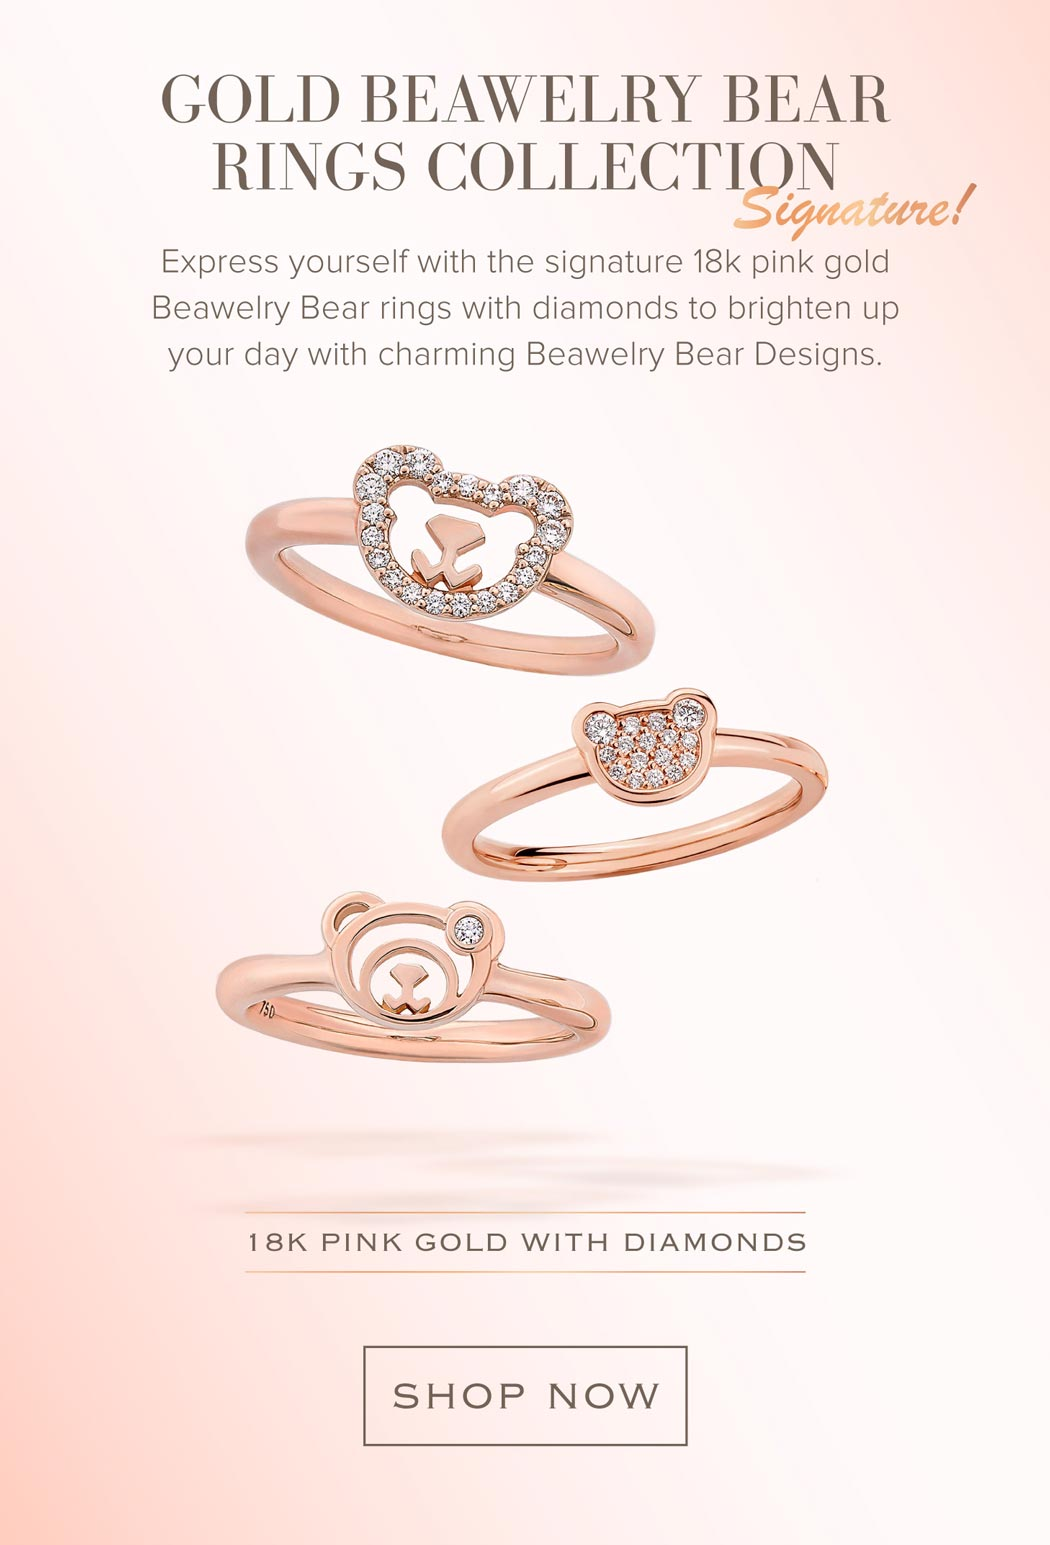 Jewelry_Carousel_Mobile-(350x515px)-01-final.jpg-M-50-1050